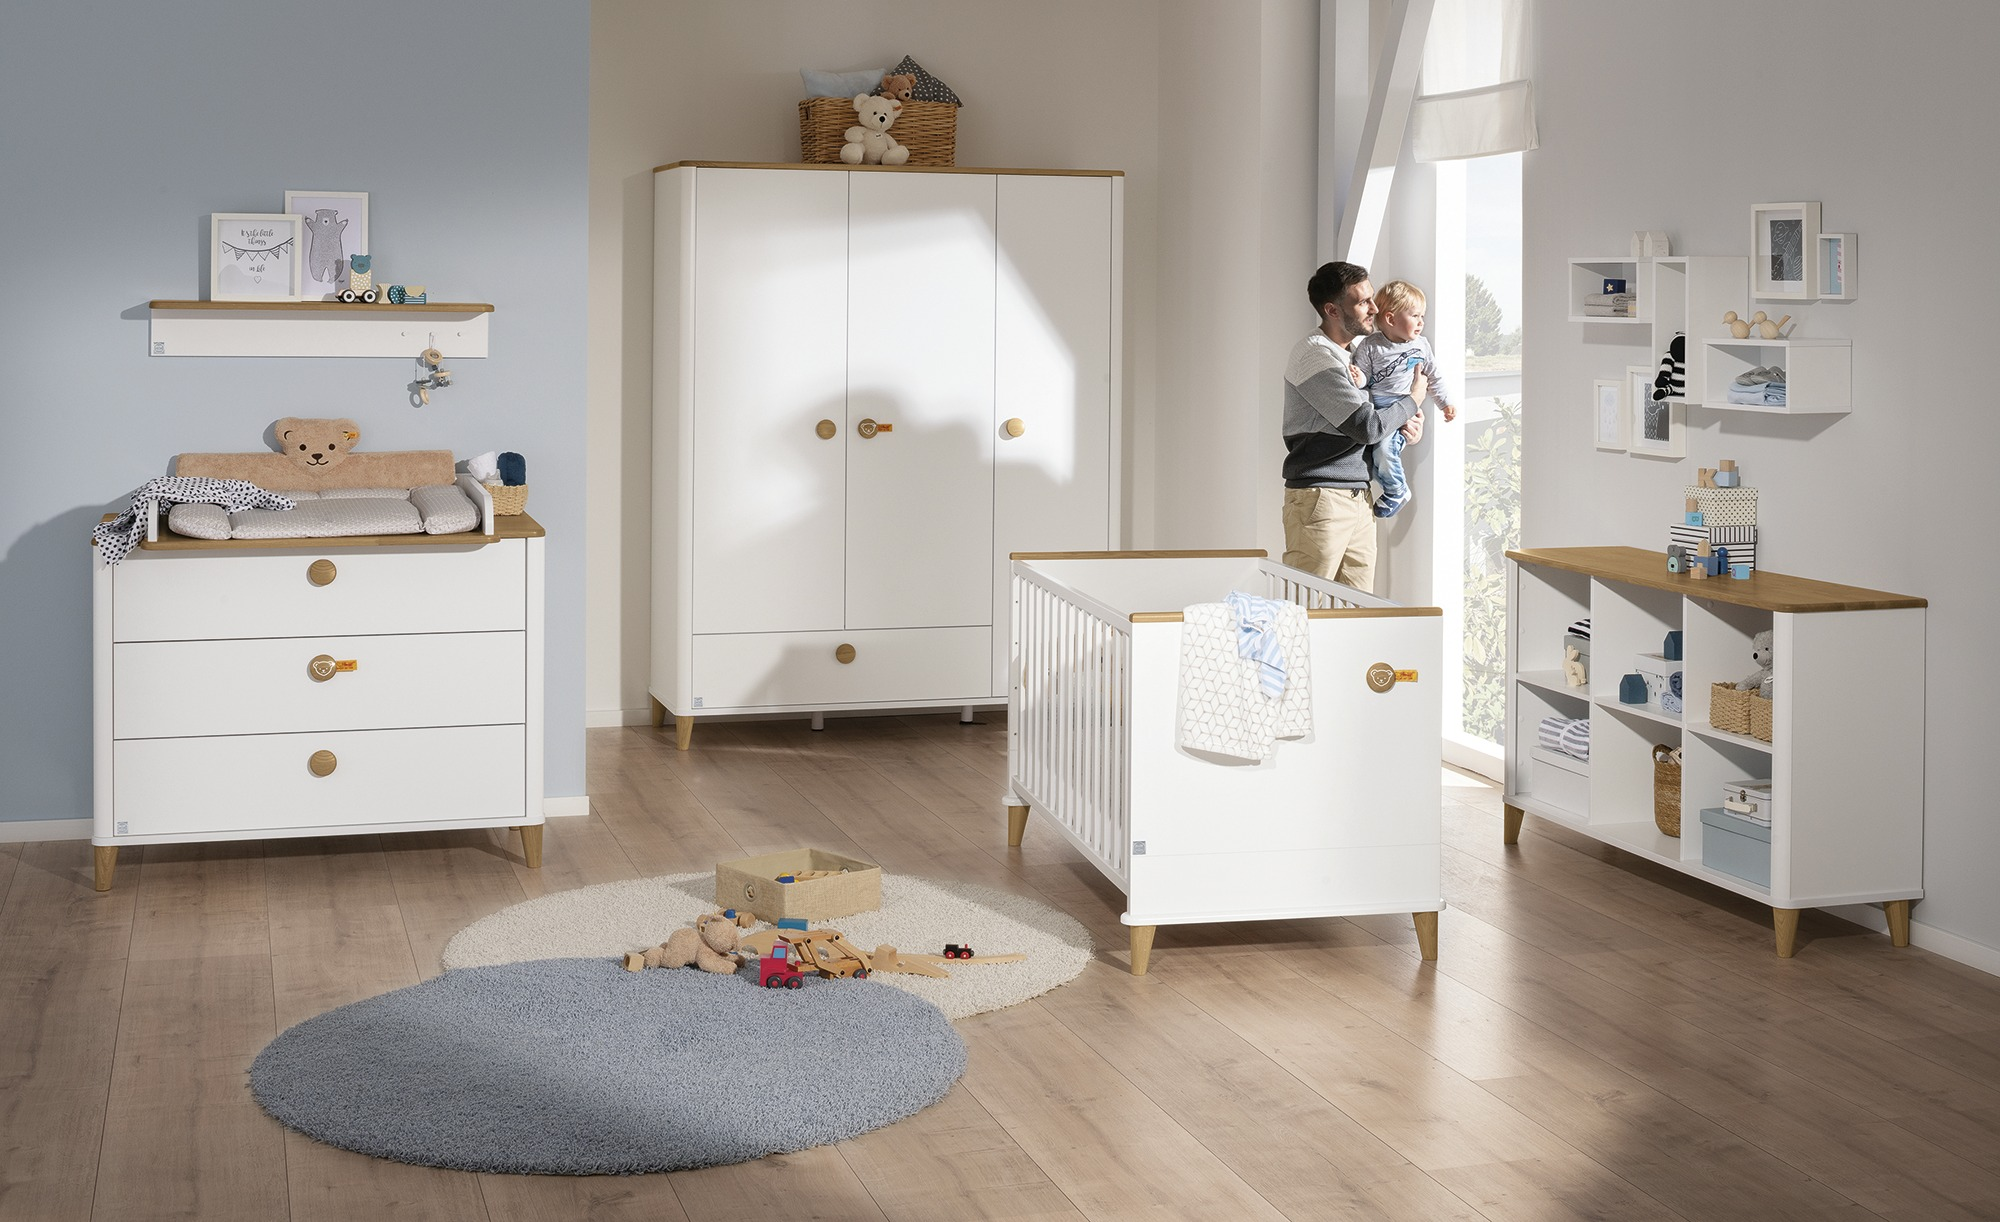 PAIDI Babybett  Lotte & Fynn - weiß - 80,4 cm - 84,3 cm - Baby > Babymöbel > Babybetten - Möbel Kraft | Kinderzimmer > Babymöbel > Babybetten & Babywiegen | PAIDI